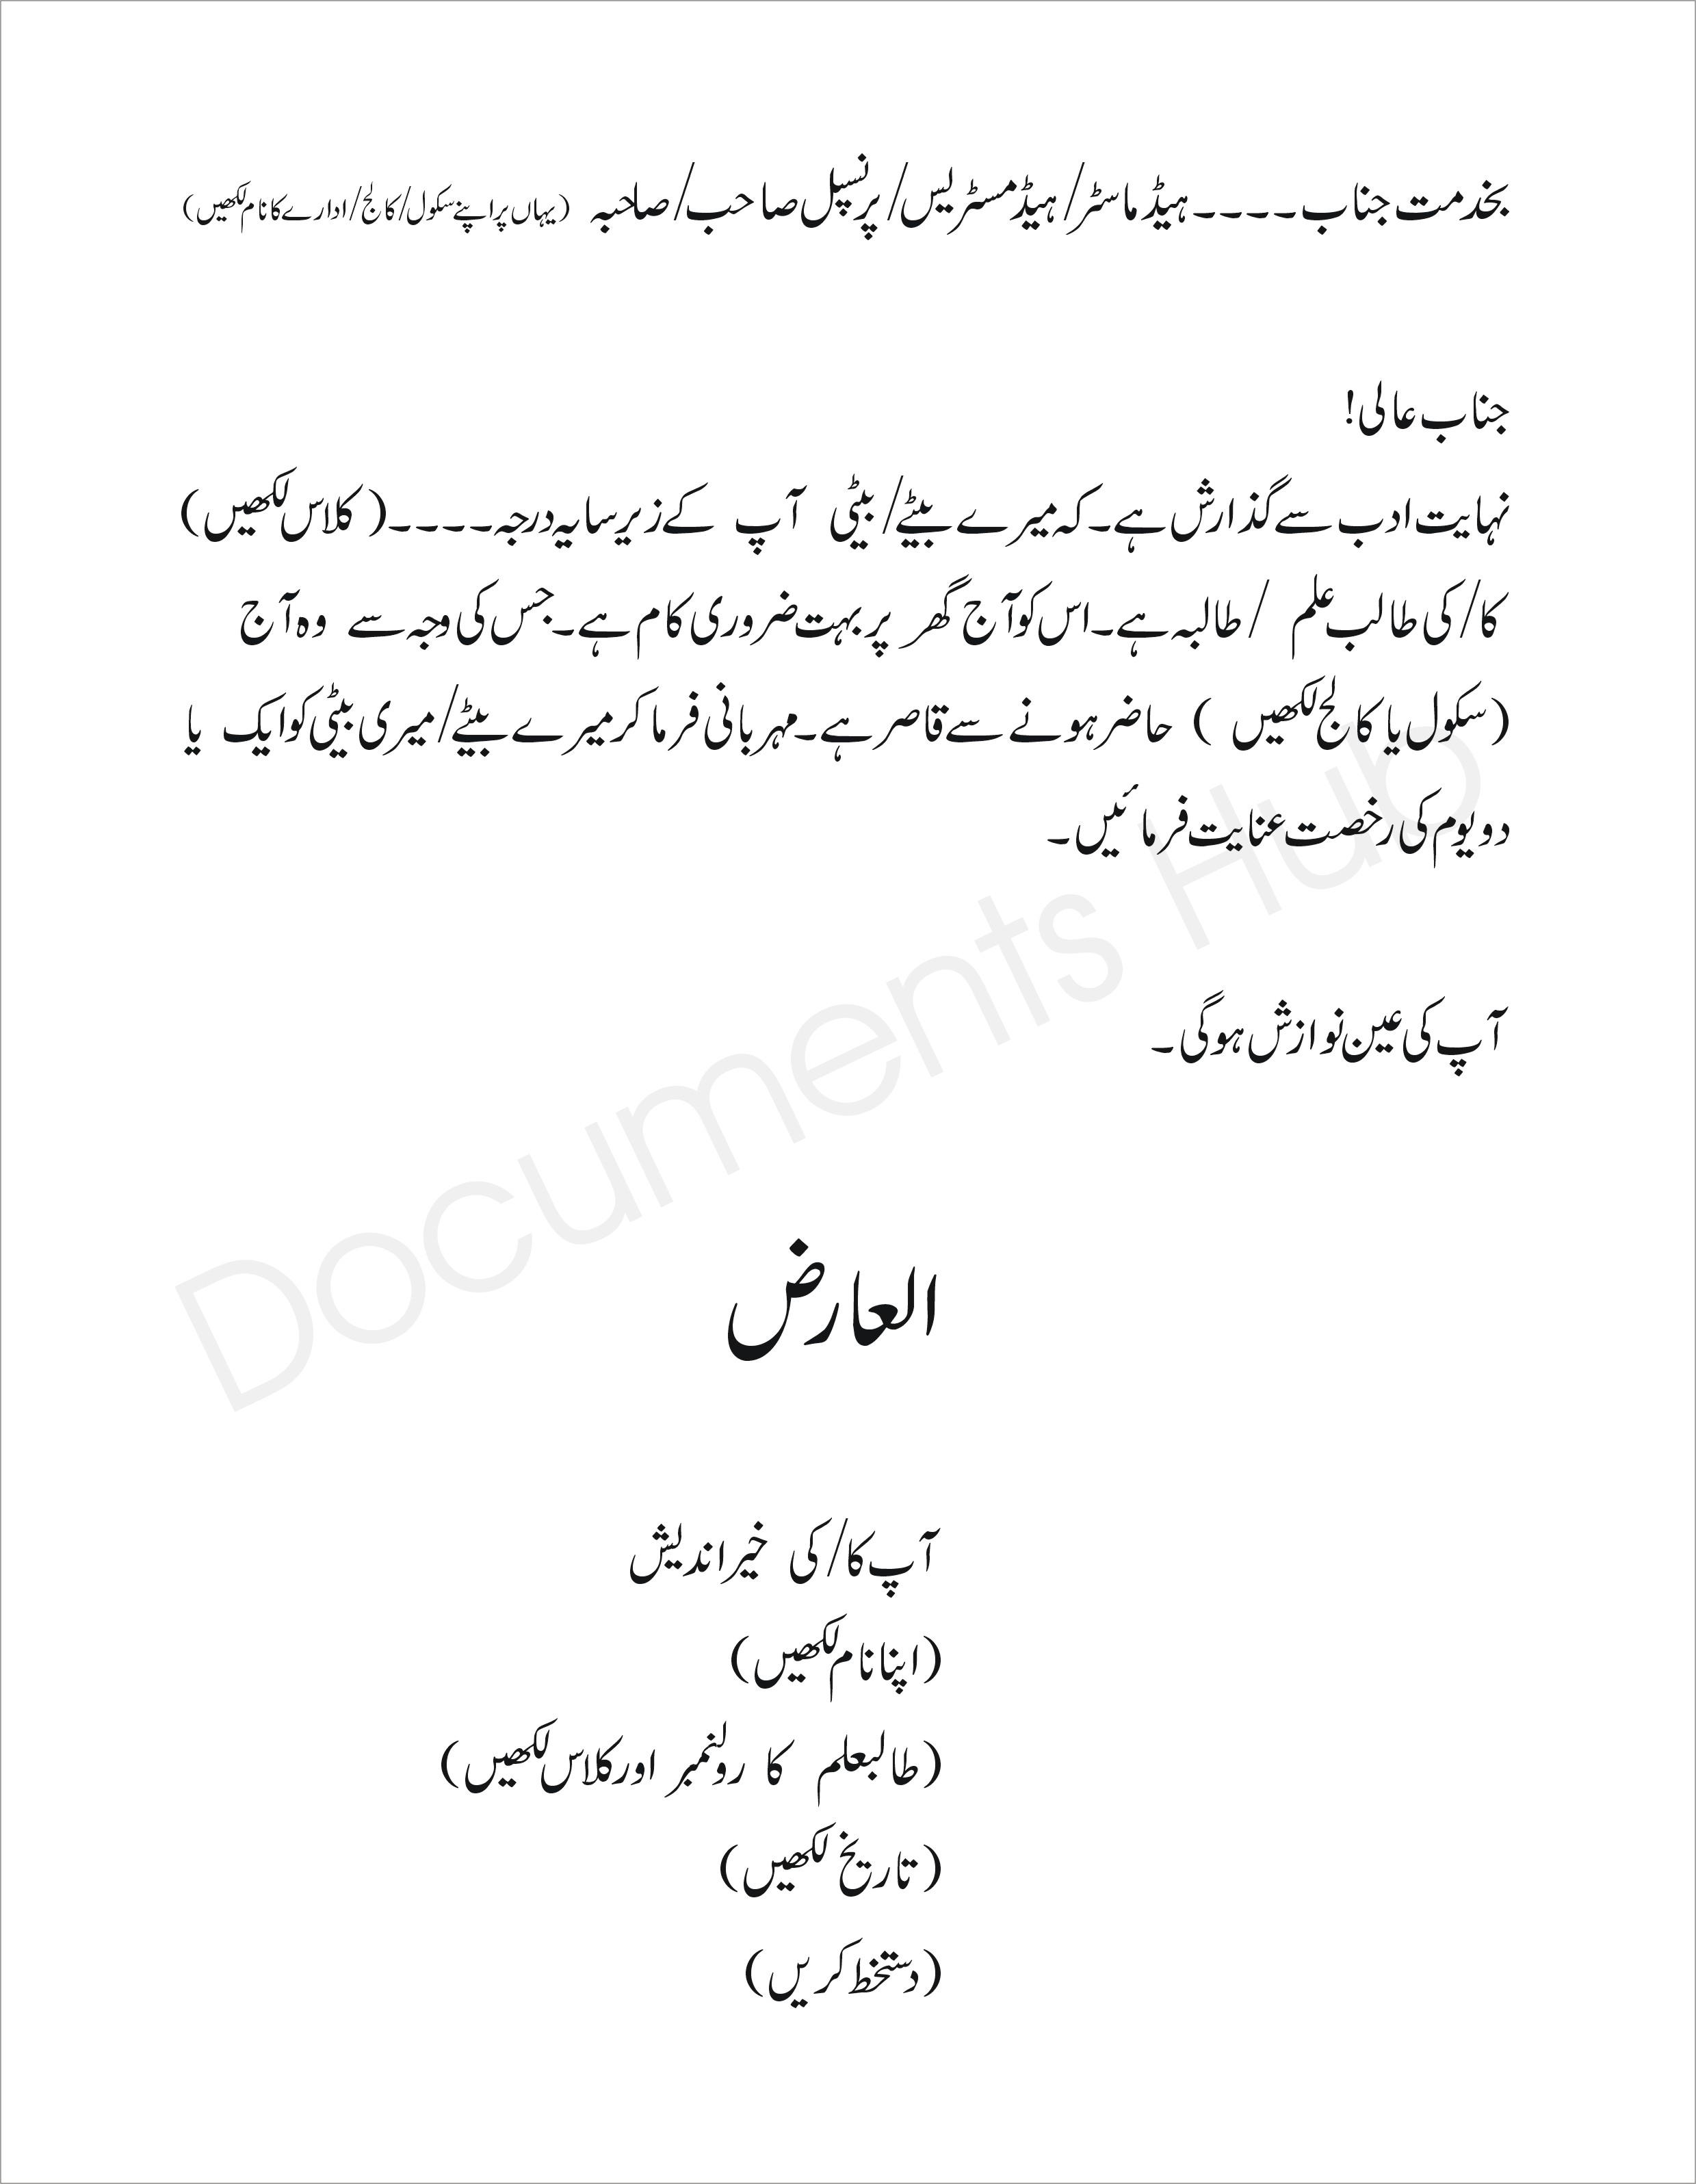 Meaning Of Cover Letter In Urdu - 200+ Cover Letter Samples